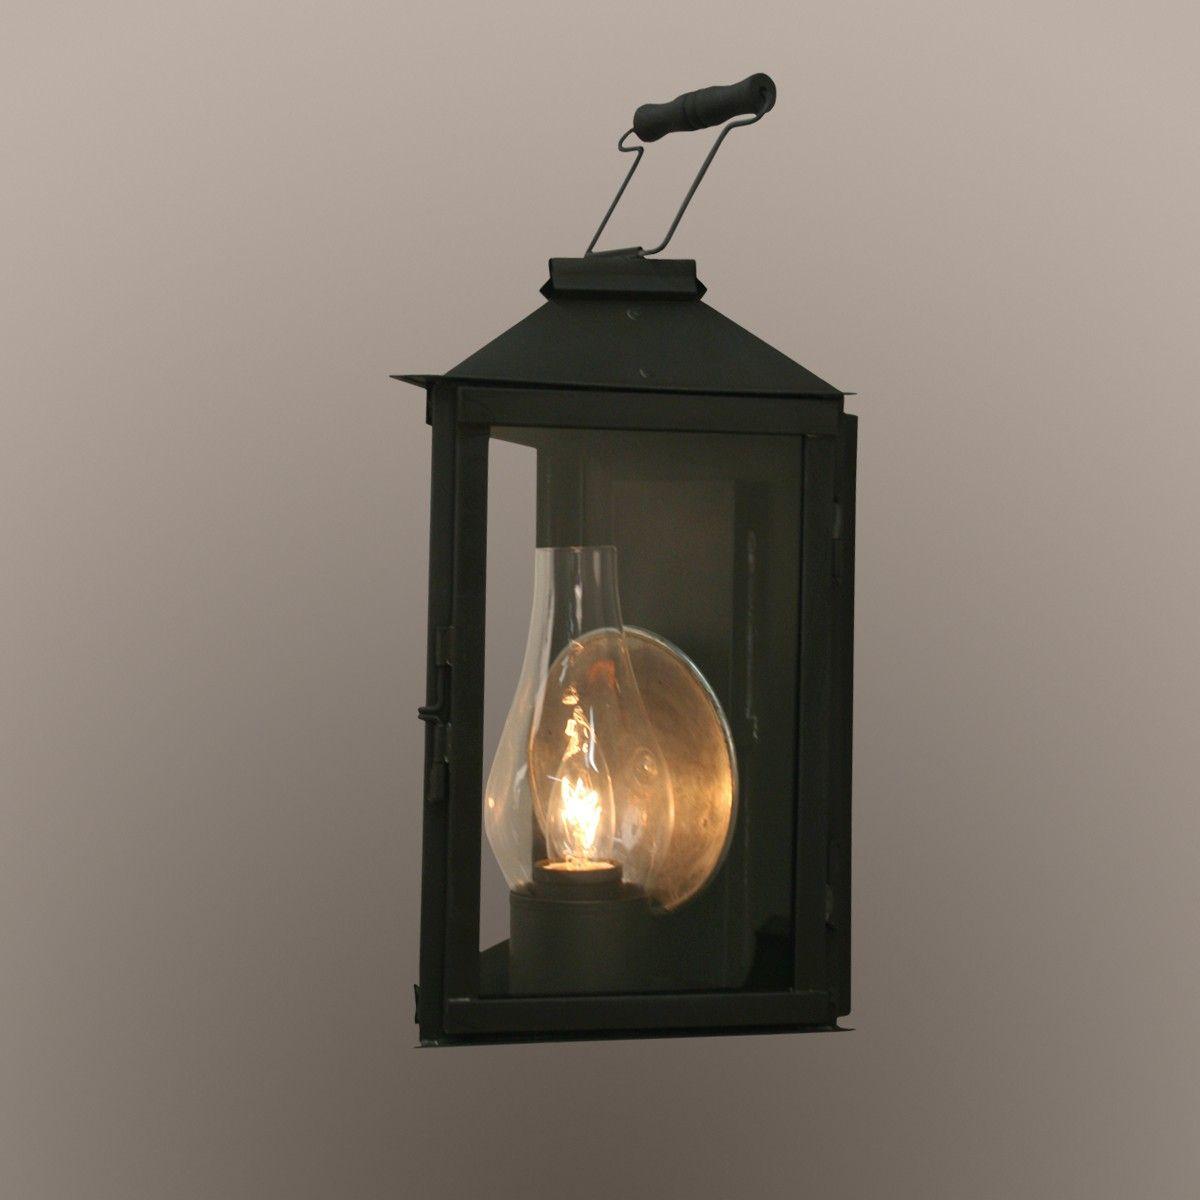 Scofield - Three-Cornered Lantern Sconce